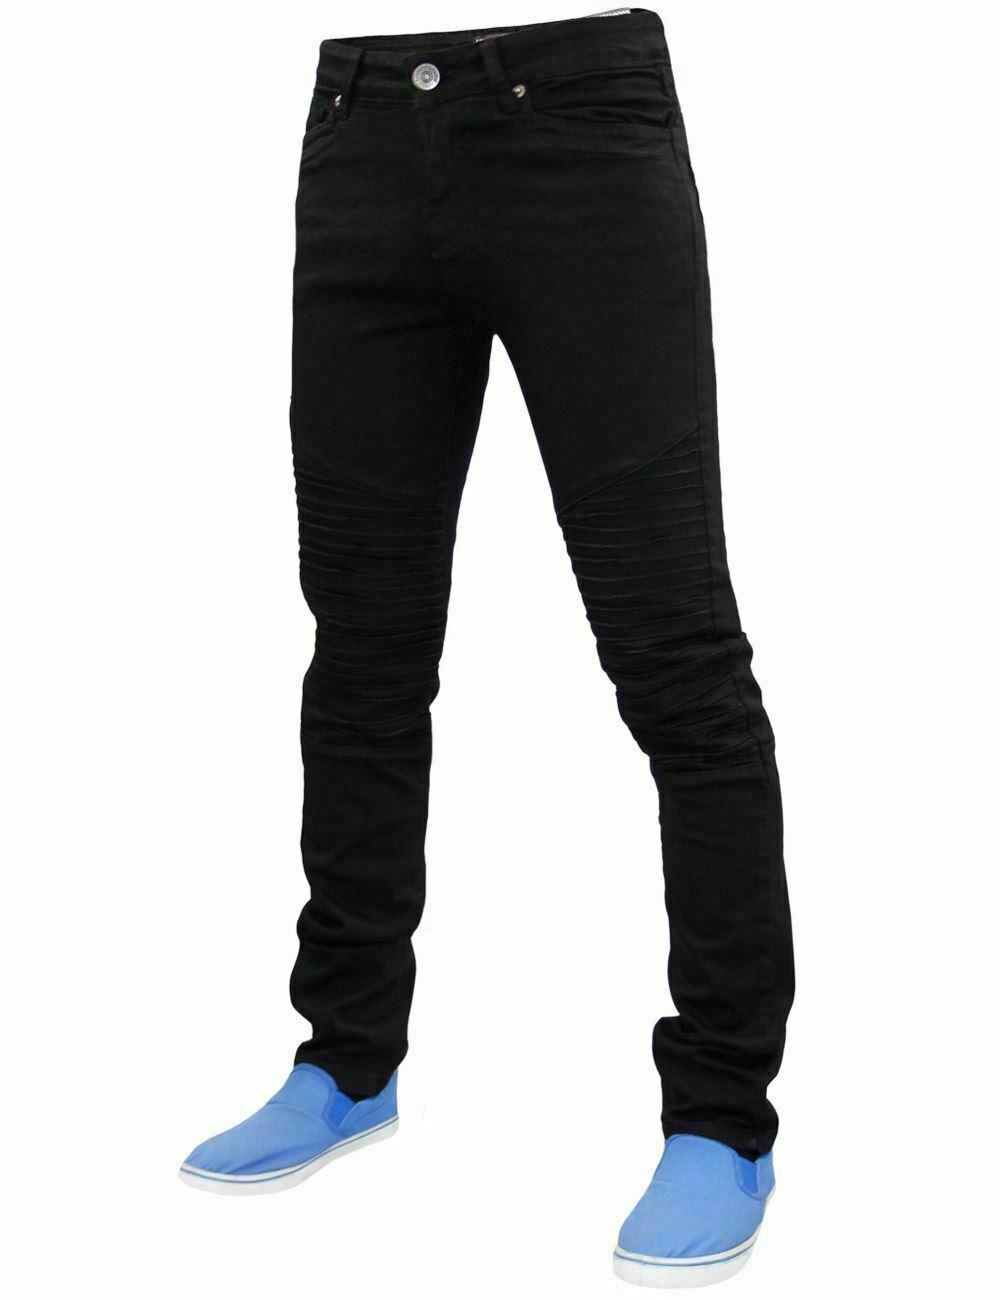 Gaffer Mens Skinny Jeans Slim Fit Trousers Denim Pants All Waist Leg Bottoms